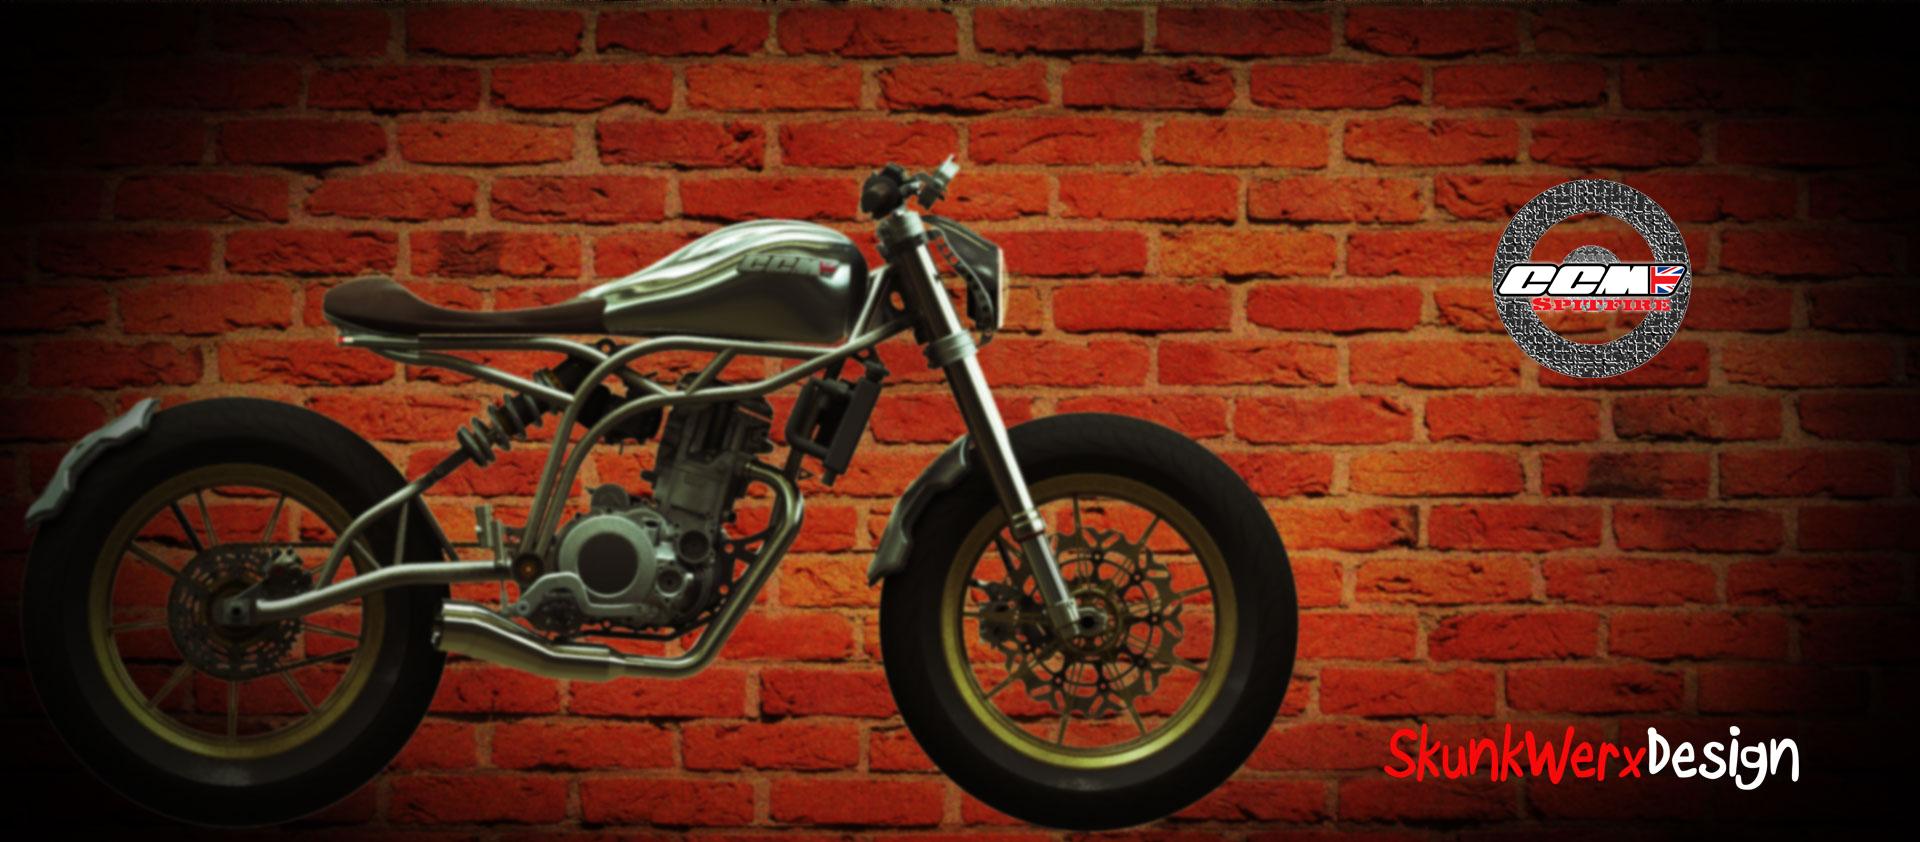 UK Motorcycle Manufacturers GP4S0 adventure Dakar Crossers